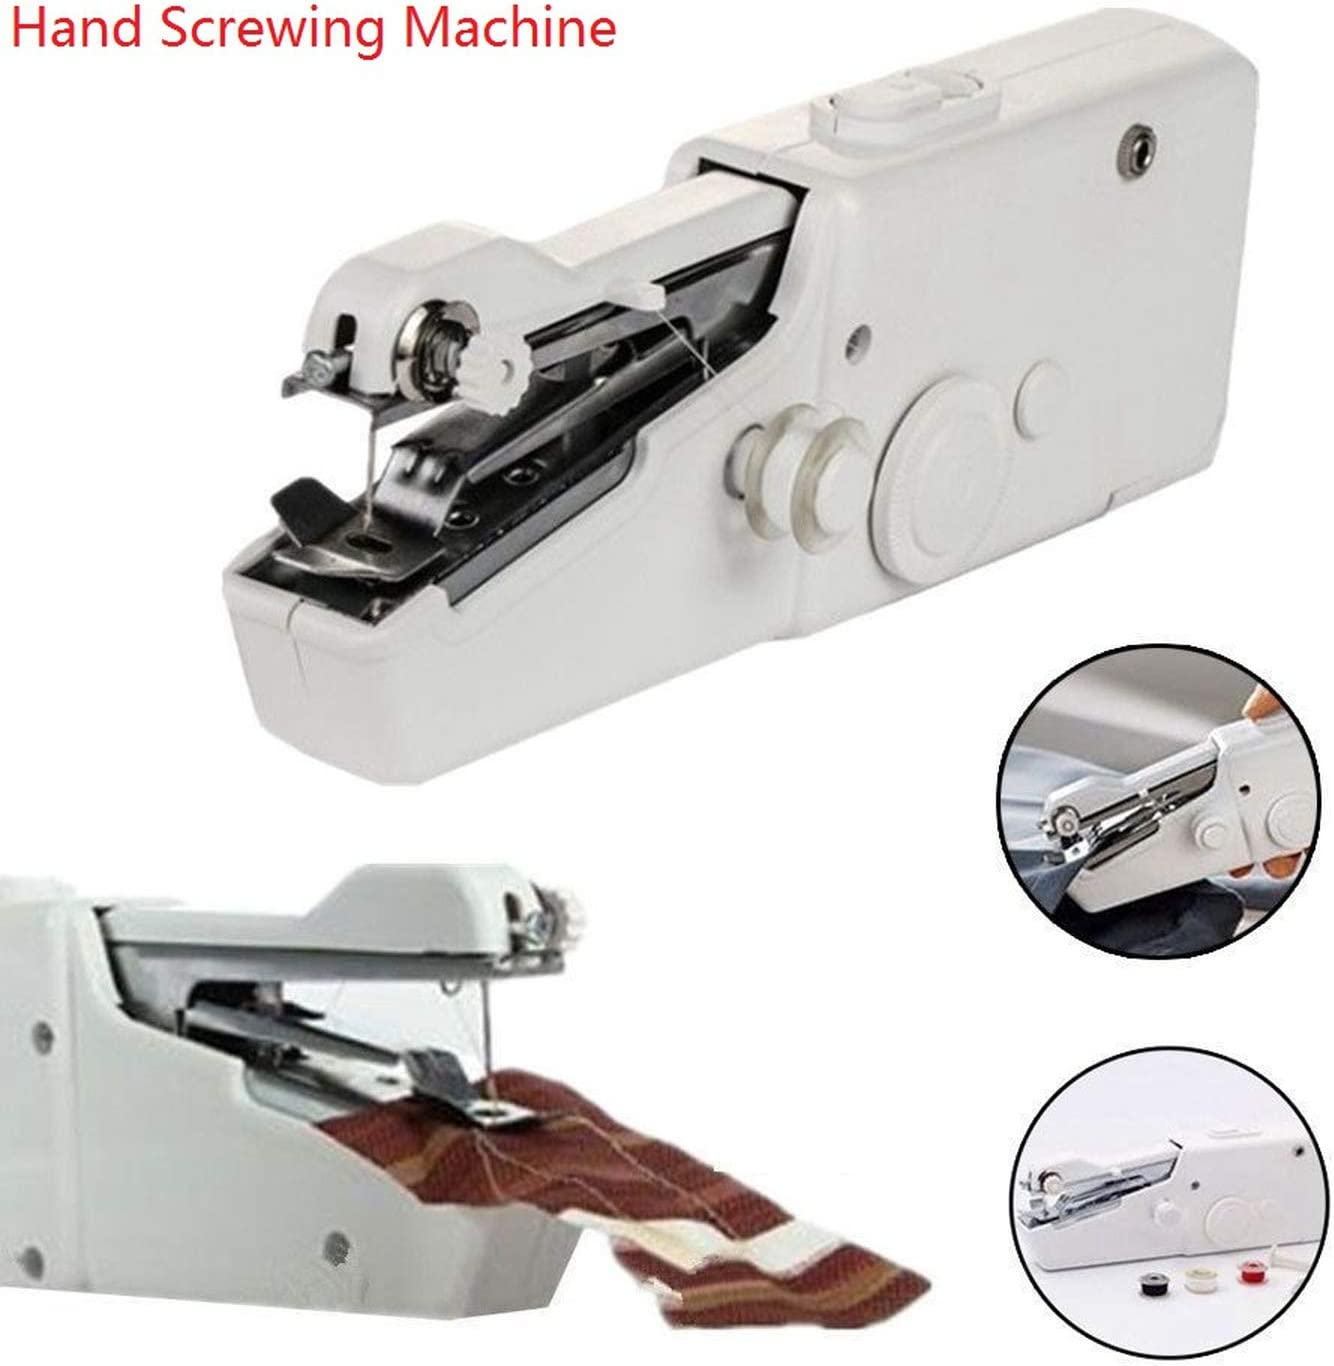 Manual * * * Mini mano portátil eléctrica máquina de coser Smart Tailor móvil Stitch Set hogar ropa plástico mano herramienta de coser Un color